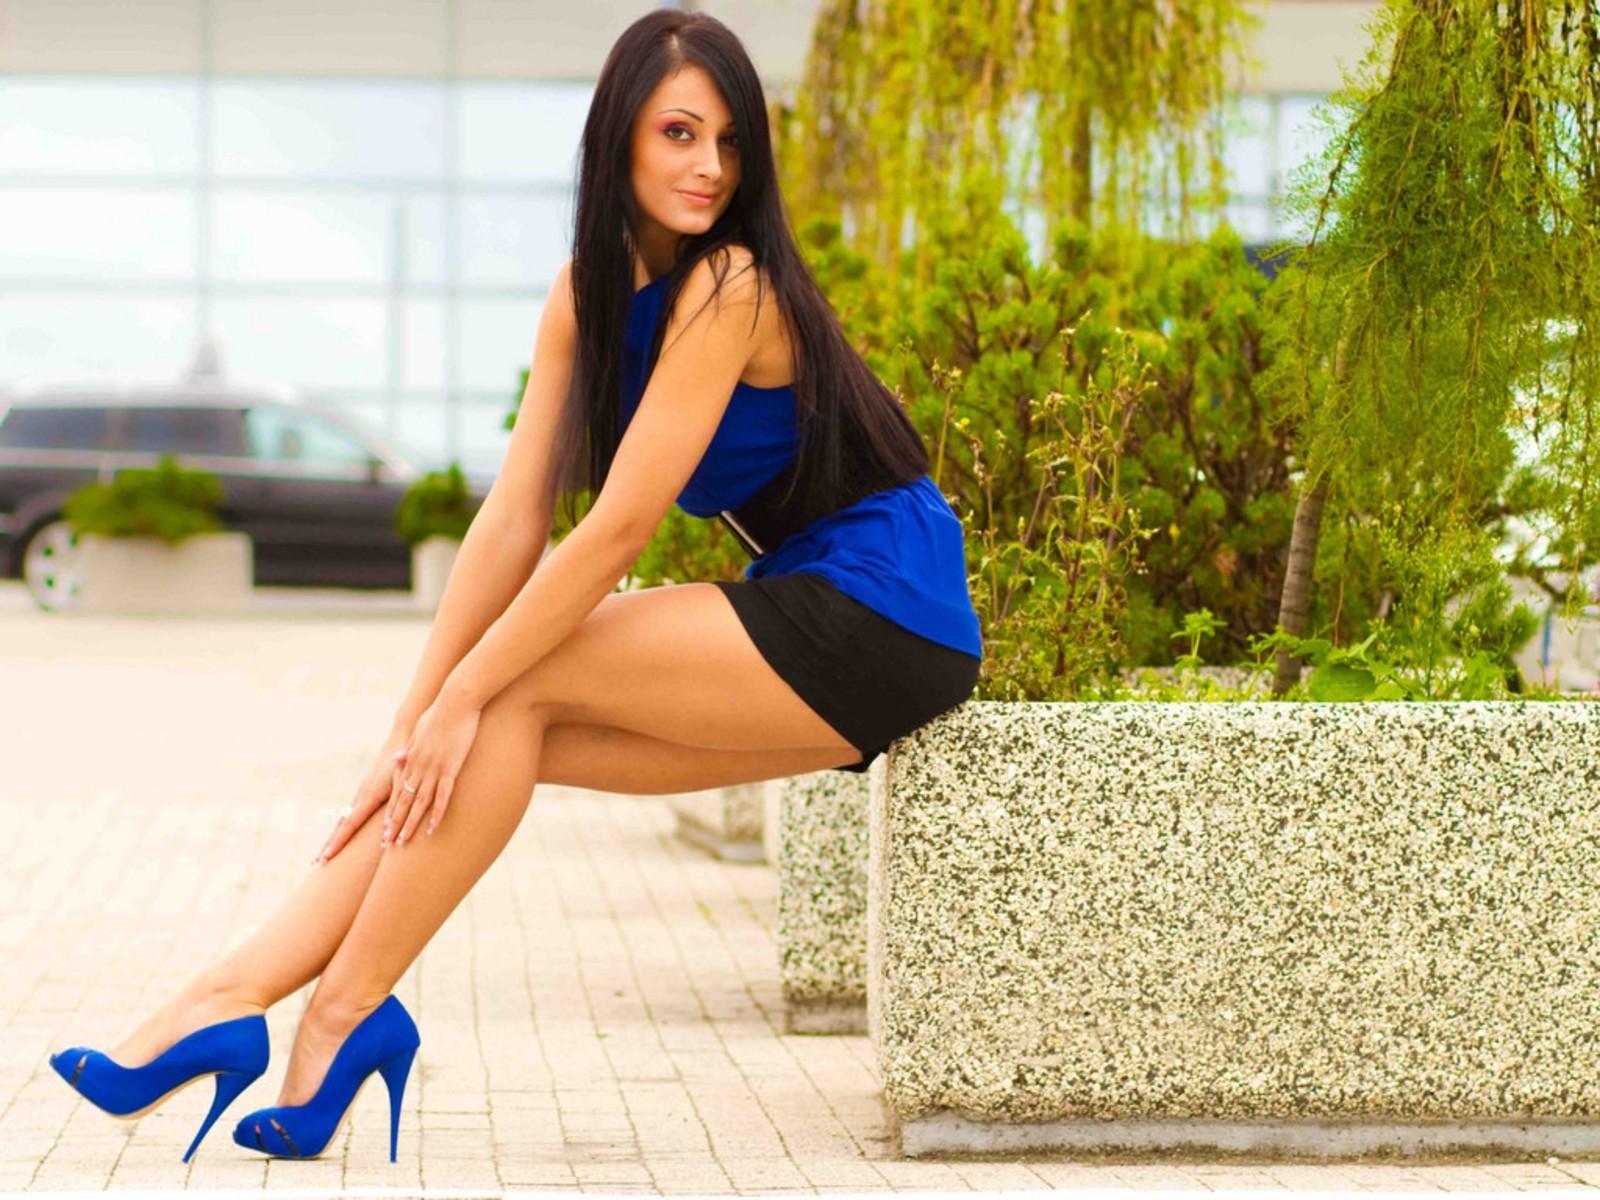 Fondos de pantalla : mujer, modelo, pelo largo, morena